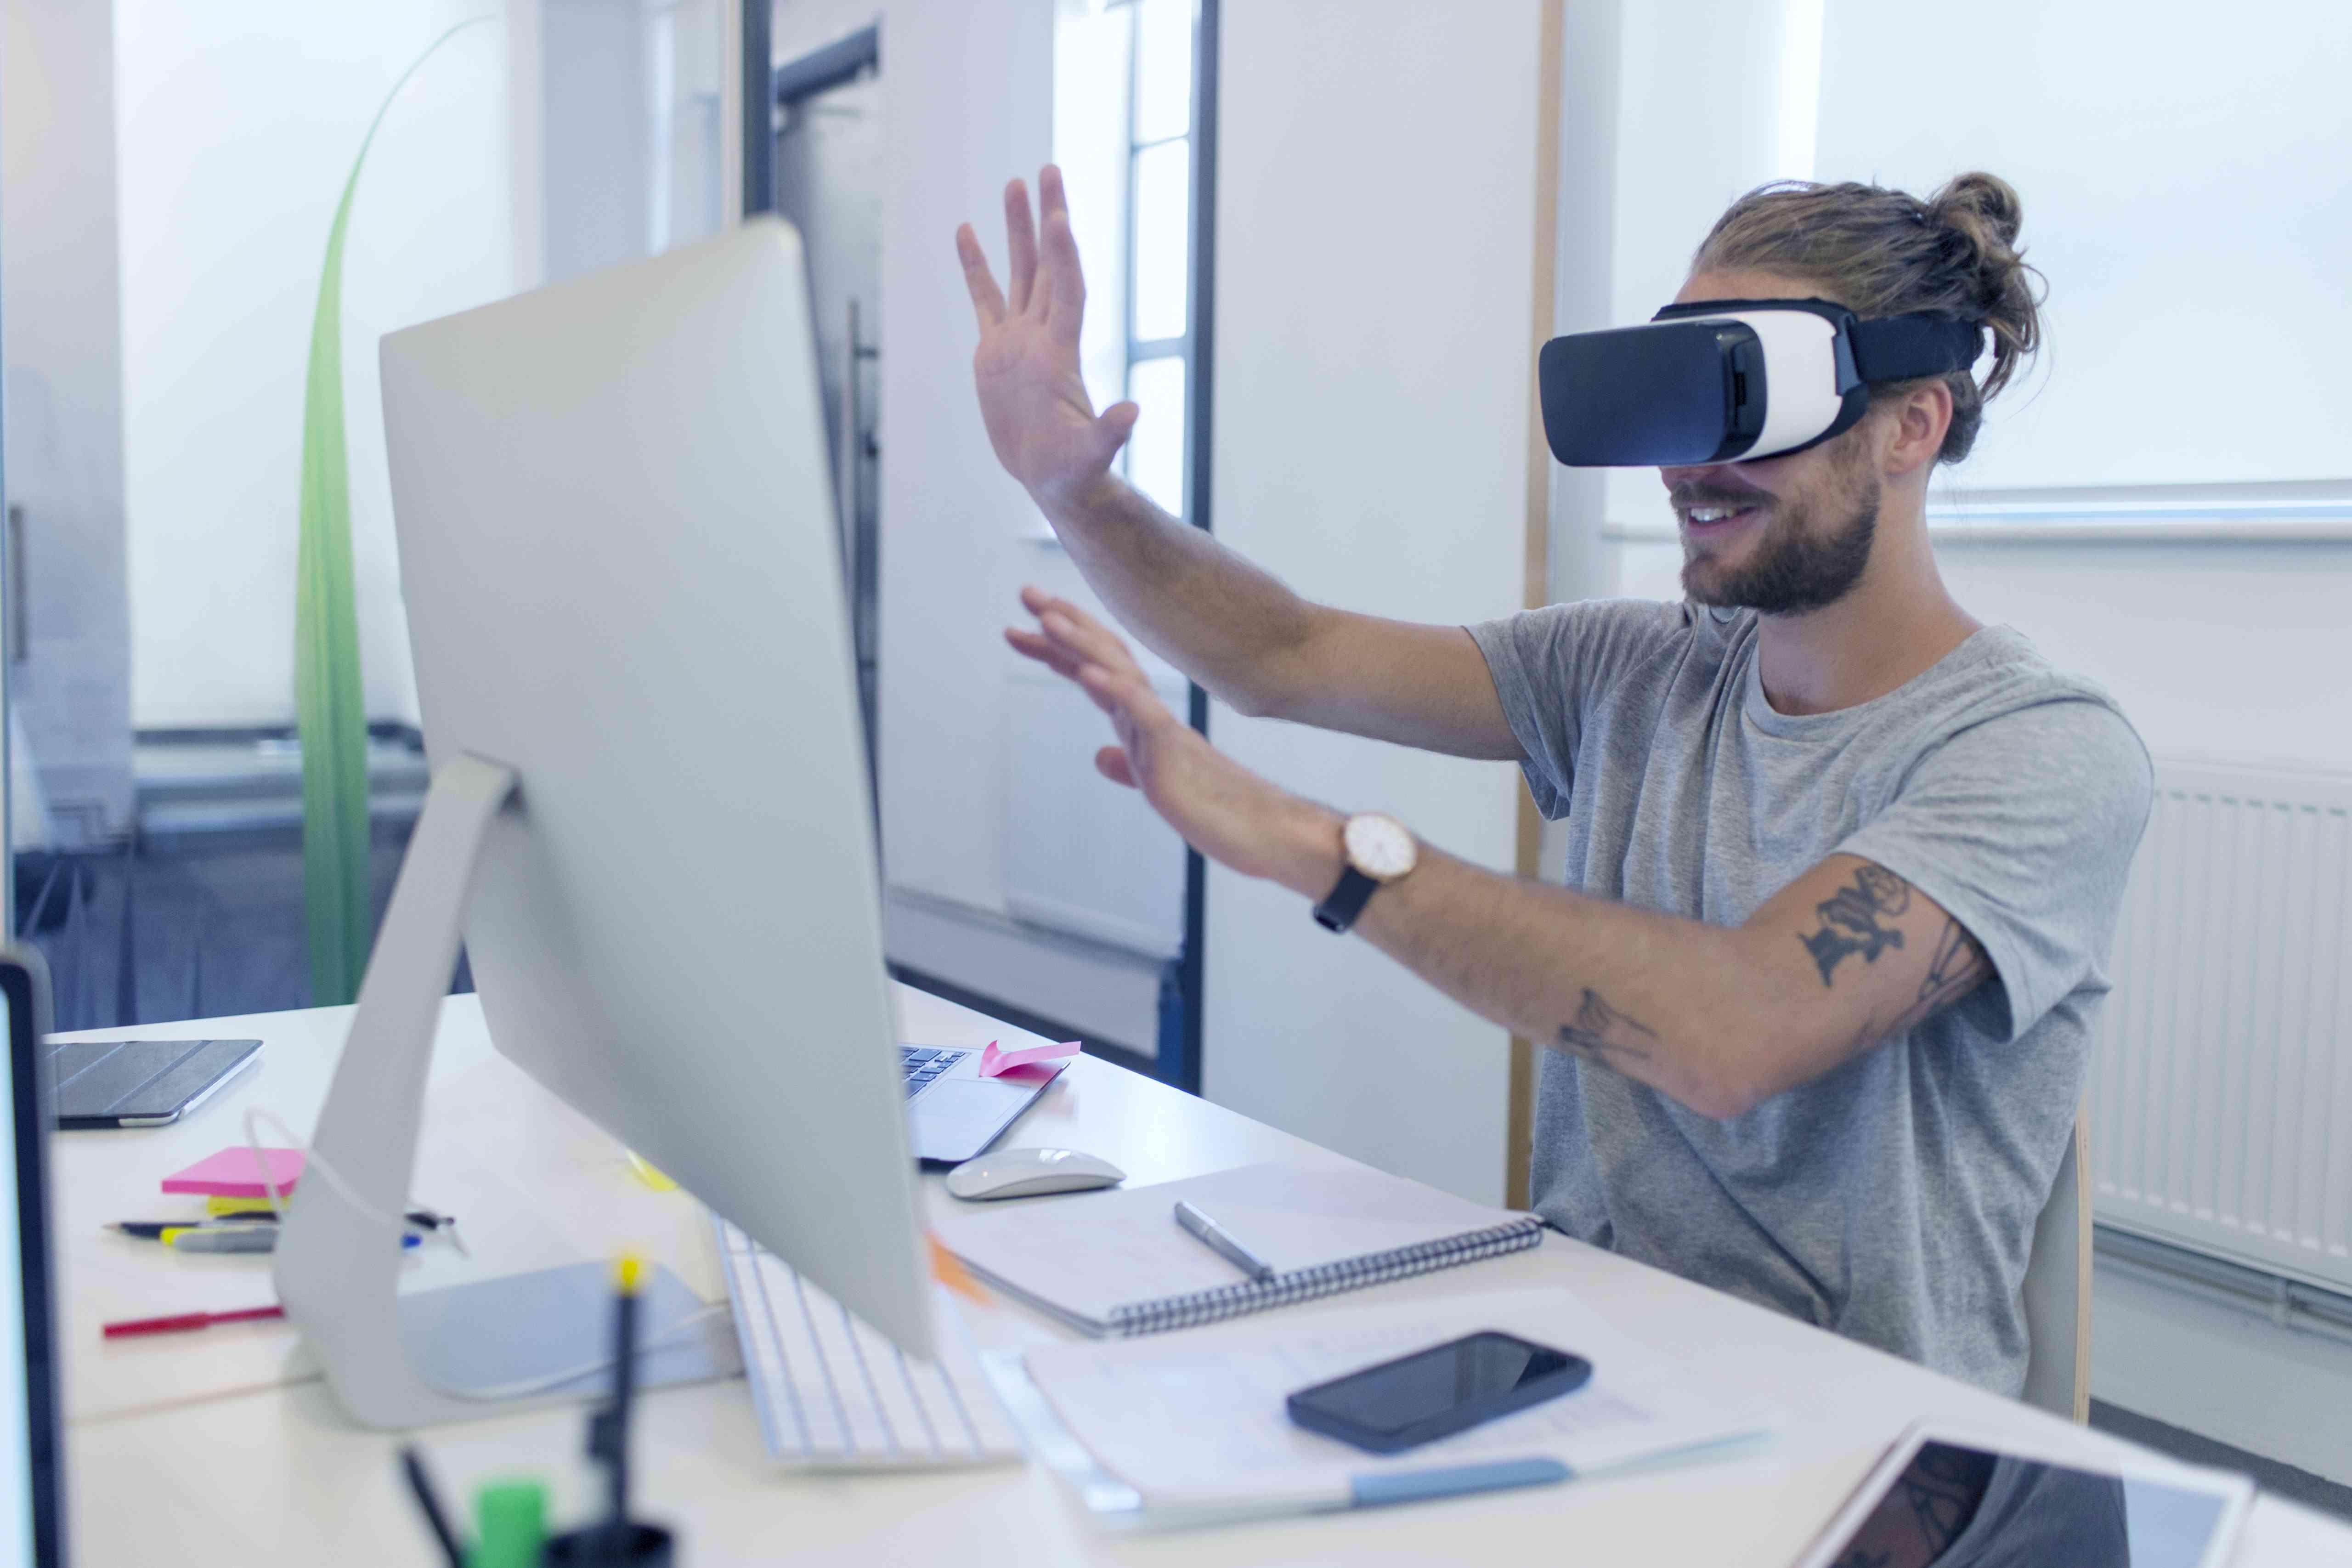 Computer programmer programming virtual reality simulator glasses at computer in office